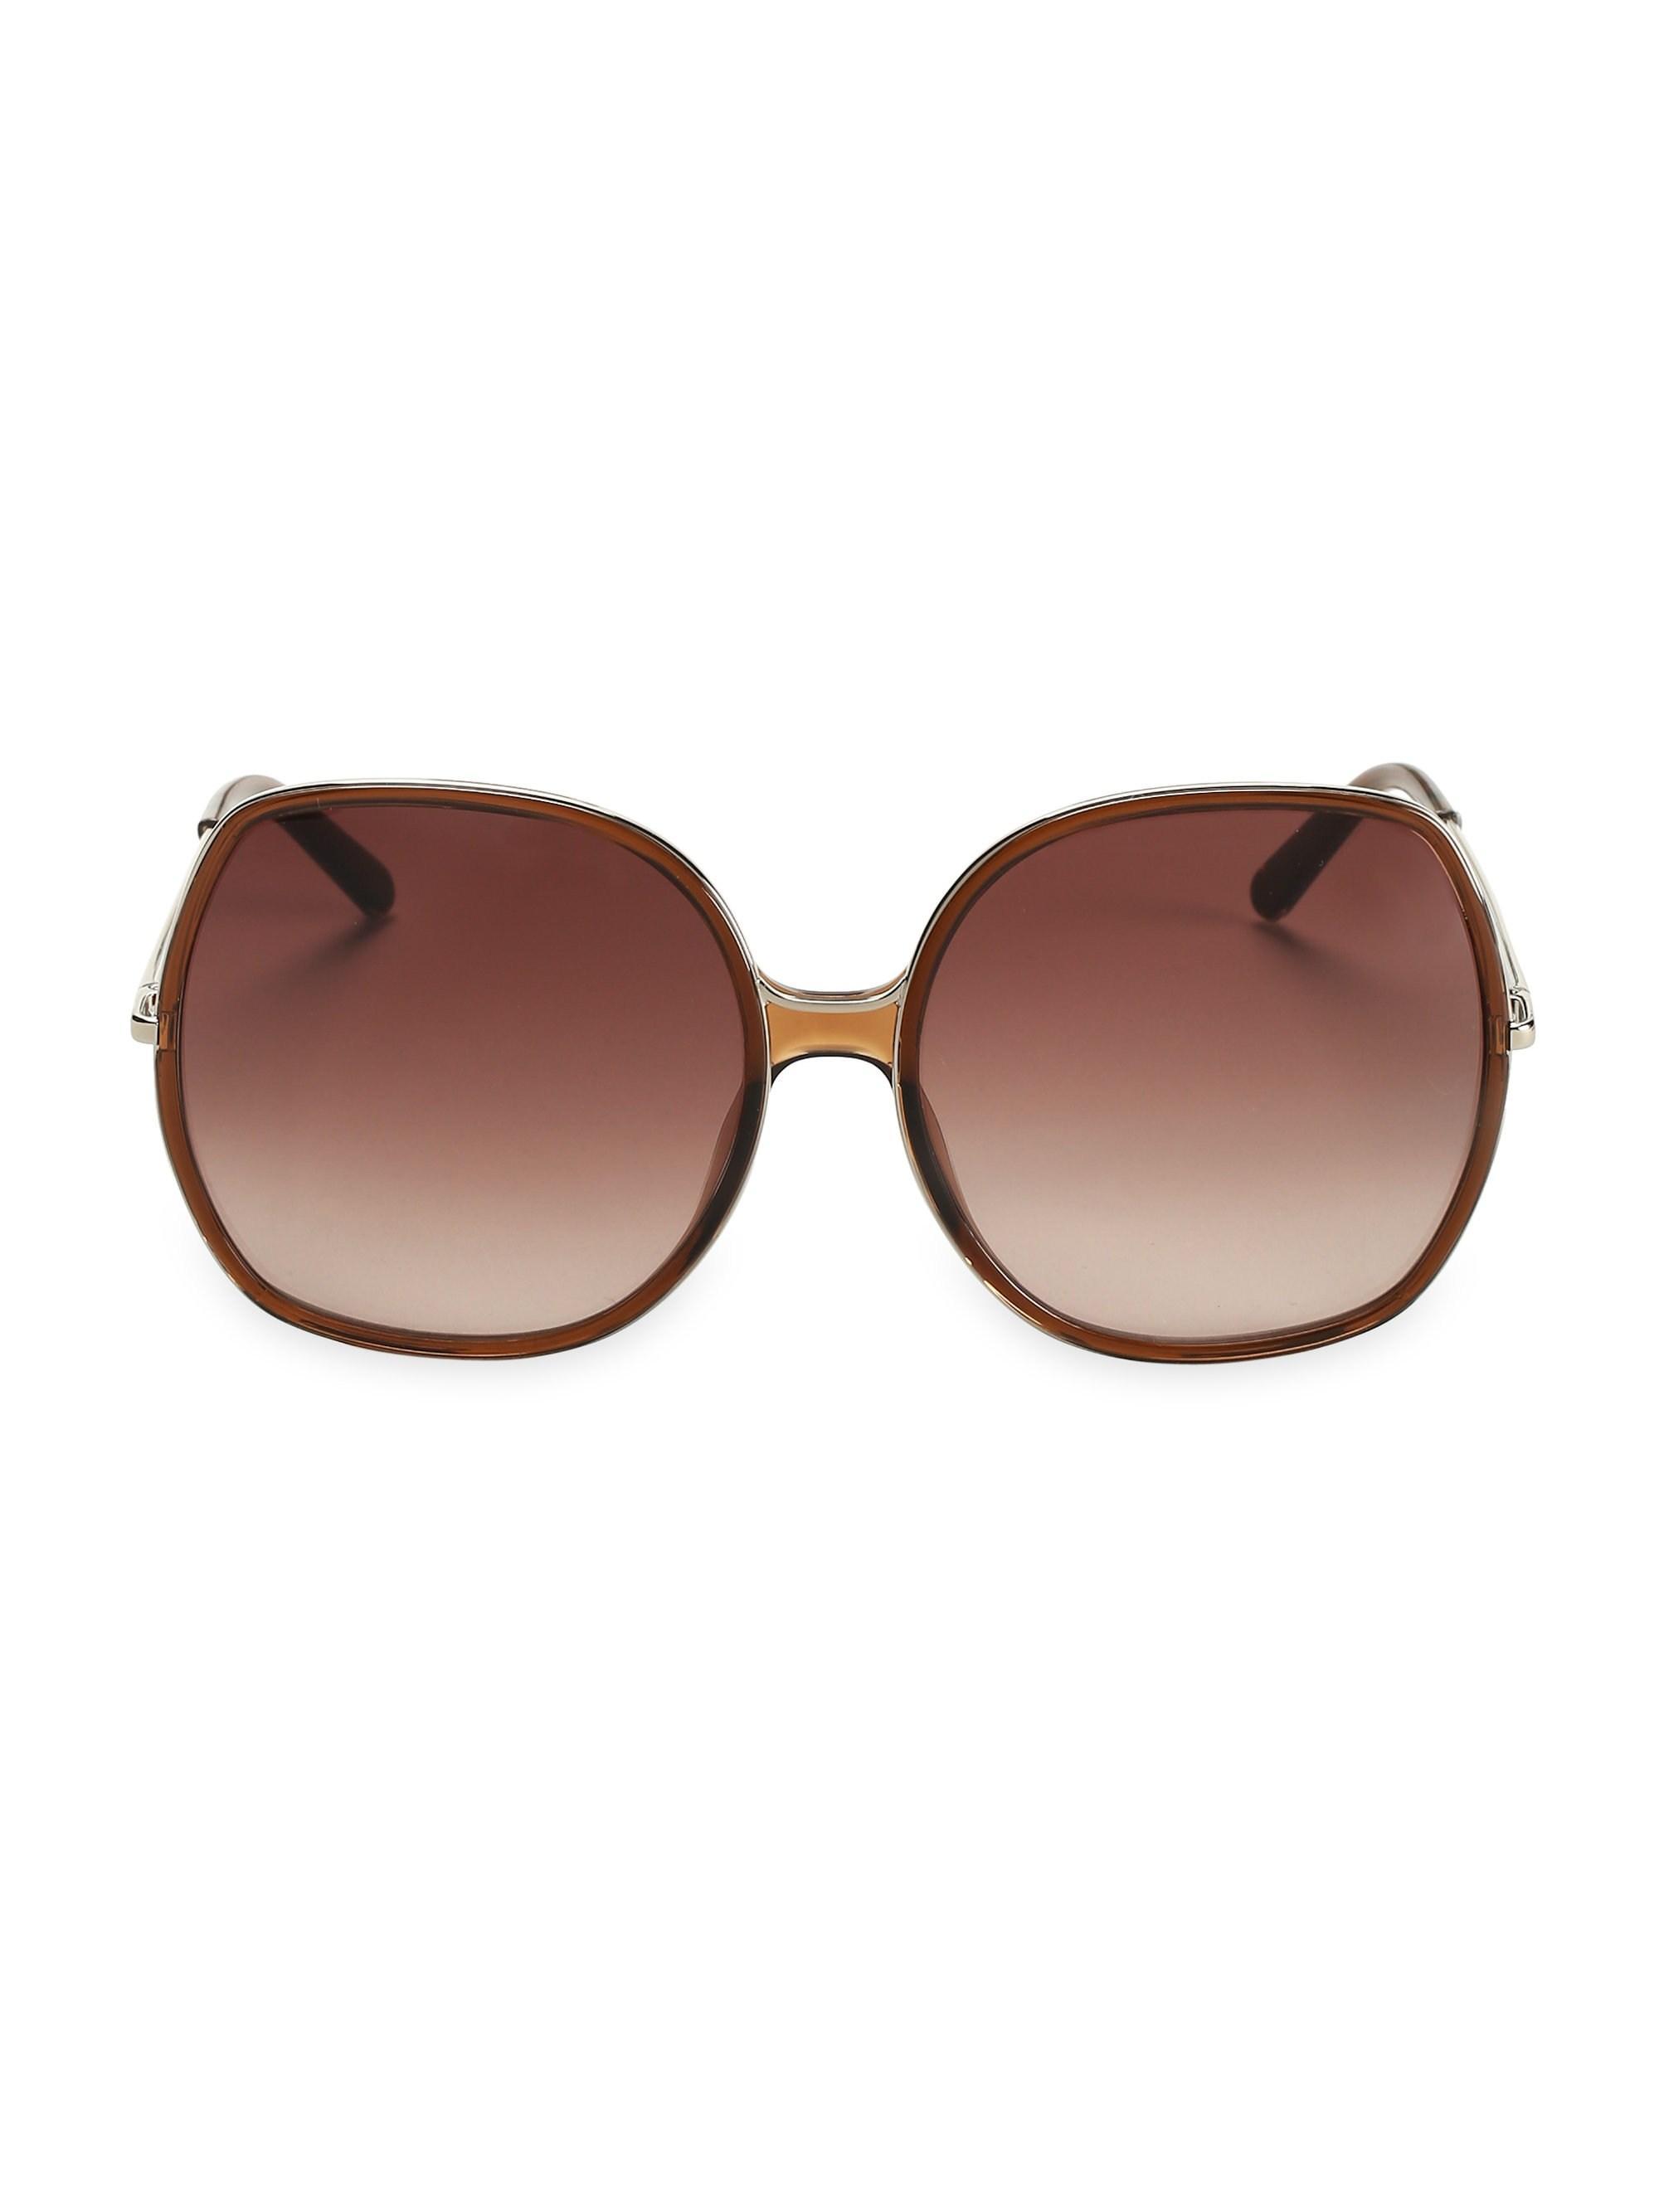 0a7cdf248a92 Lyst - Chloé Women s Turtledove 62mm Oversized Round Sunglasses ...